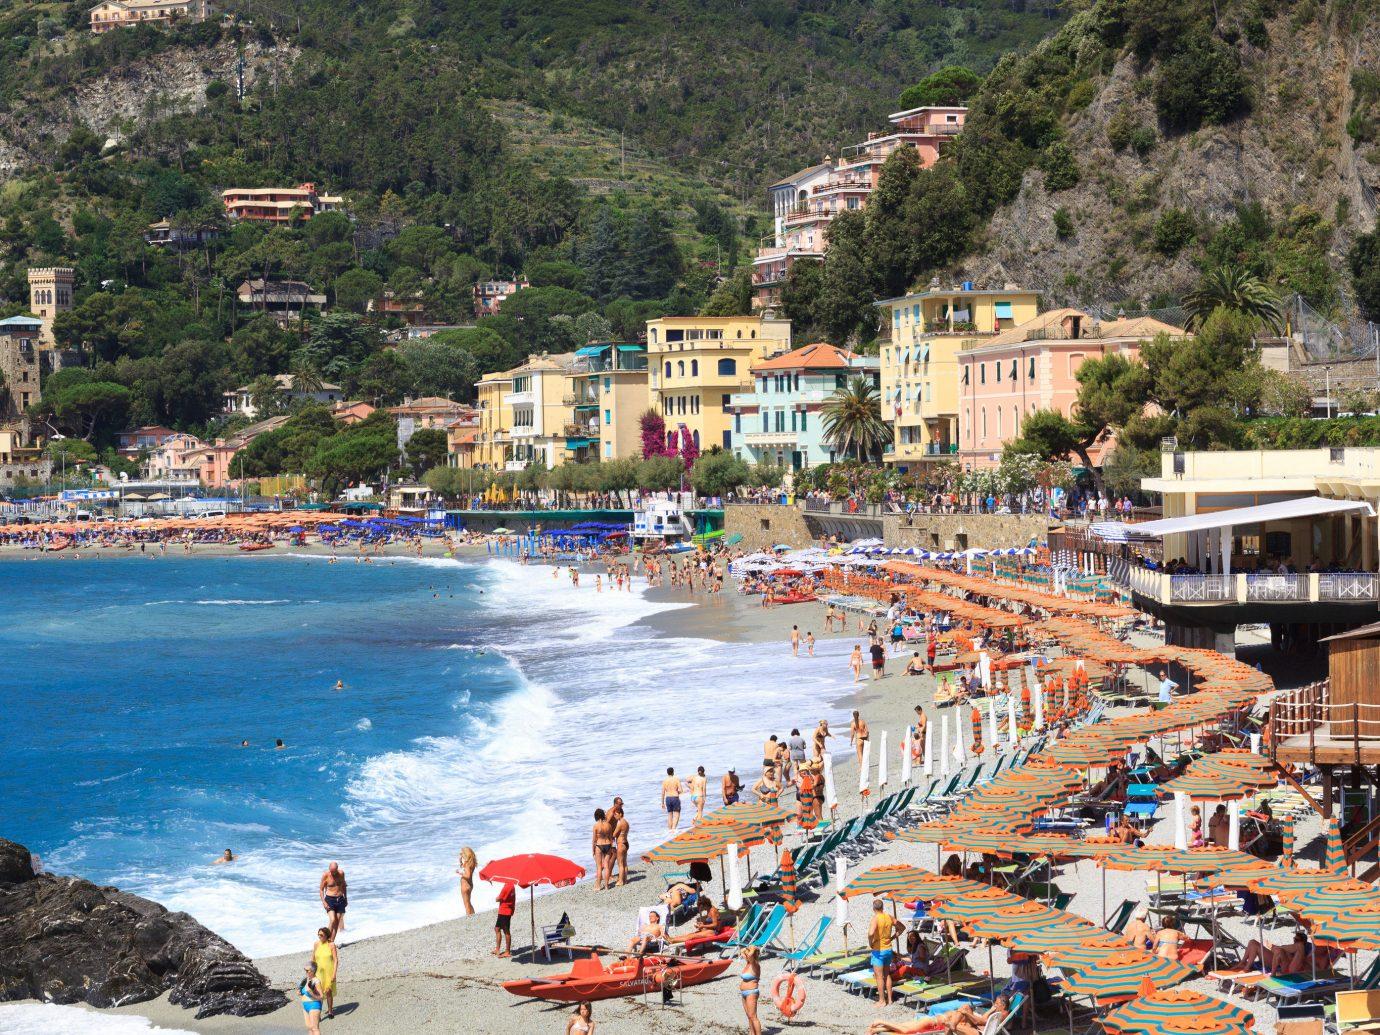 Budget outdoor scene mountain Beach Harbor Town body of water Sea vacation Coast bay Resort marina several